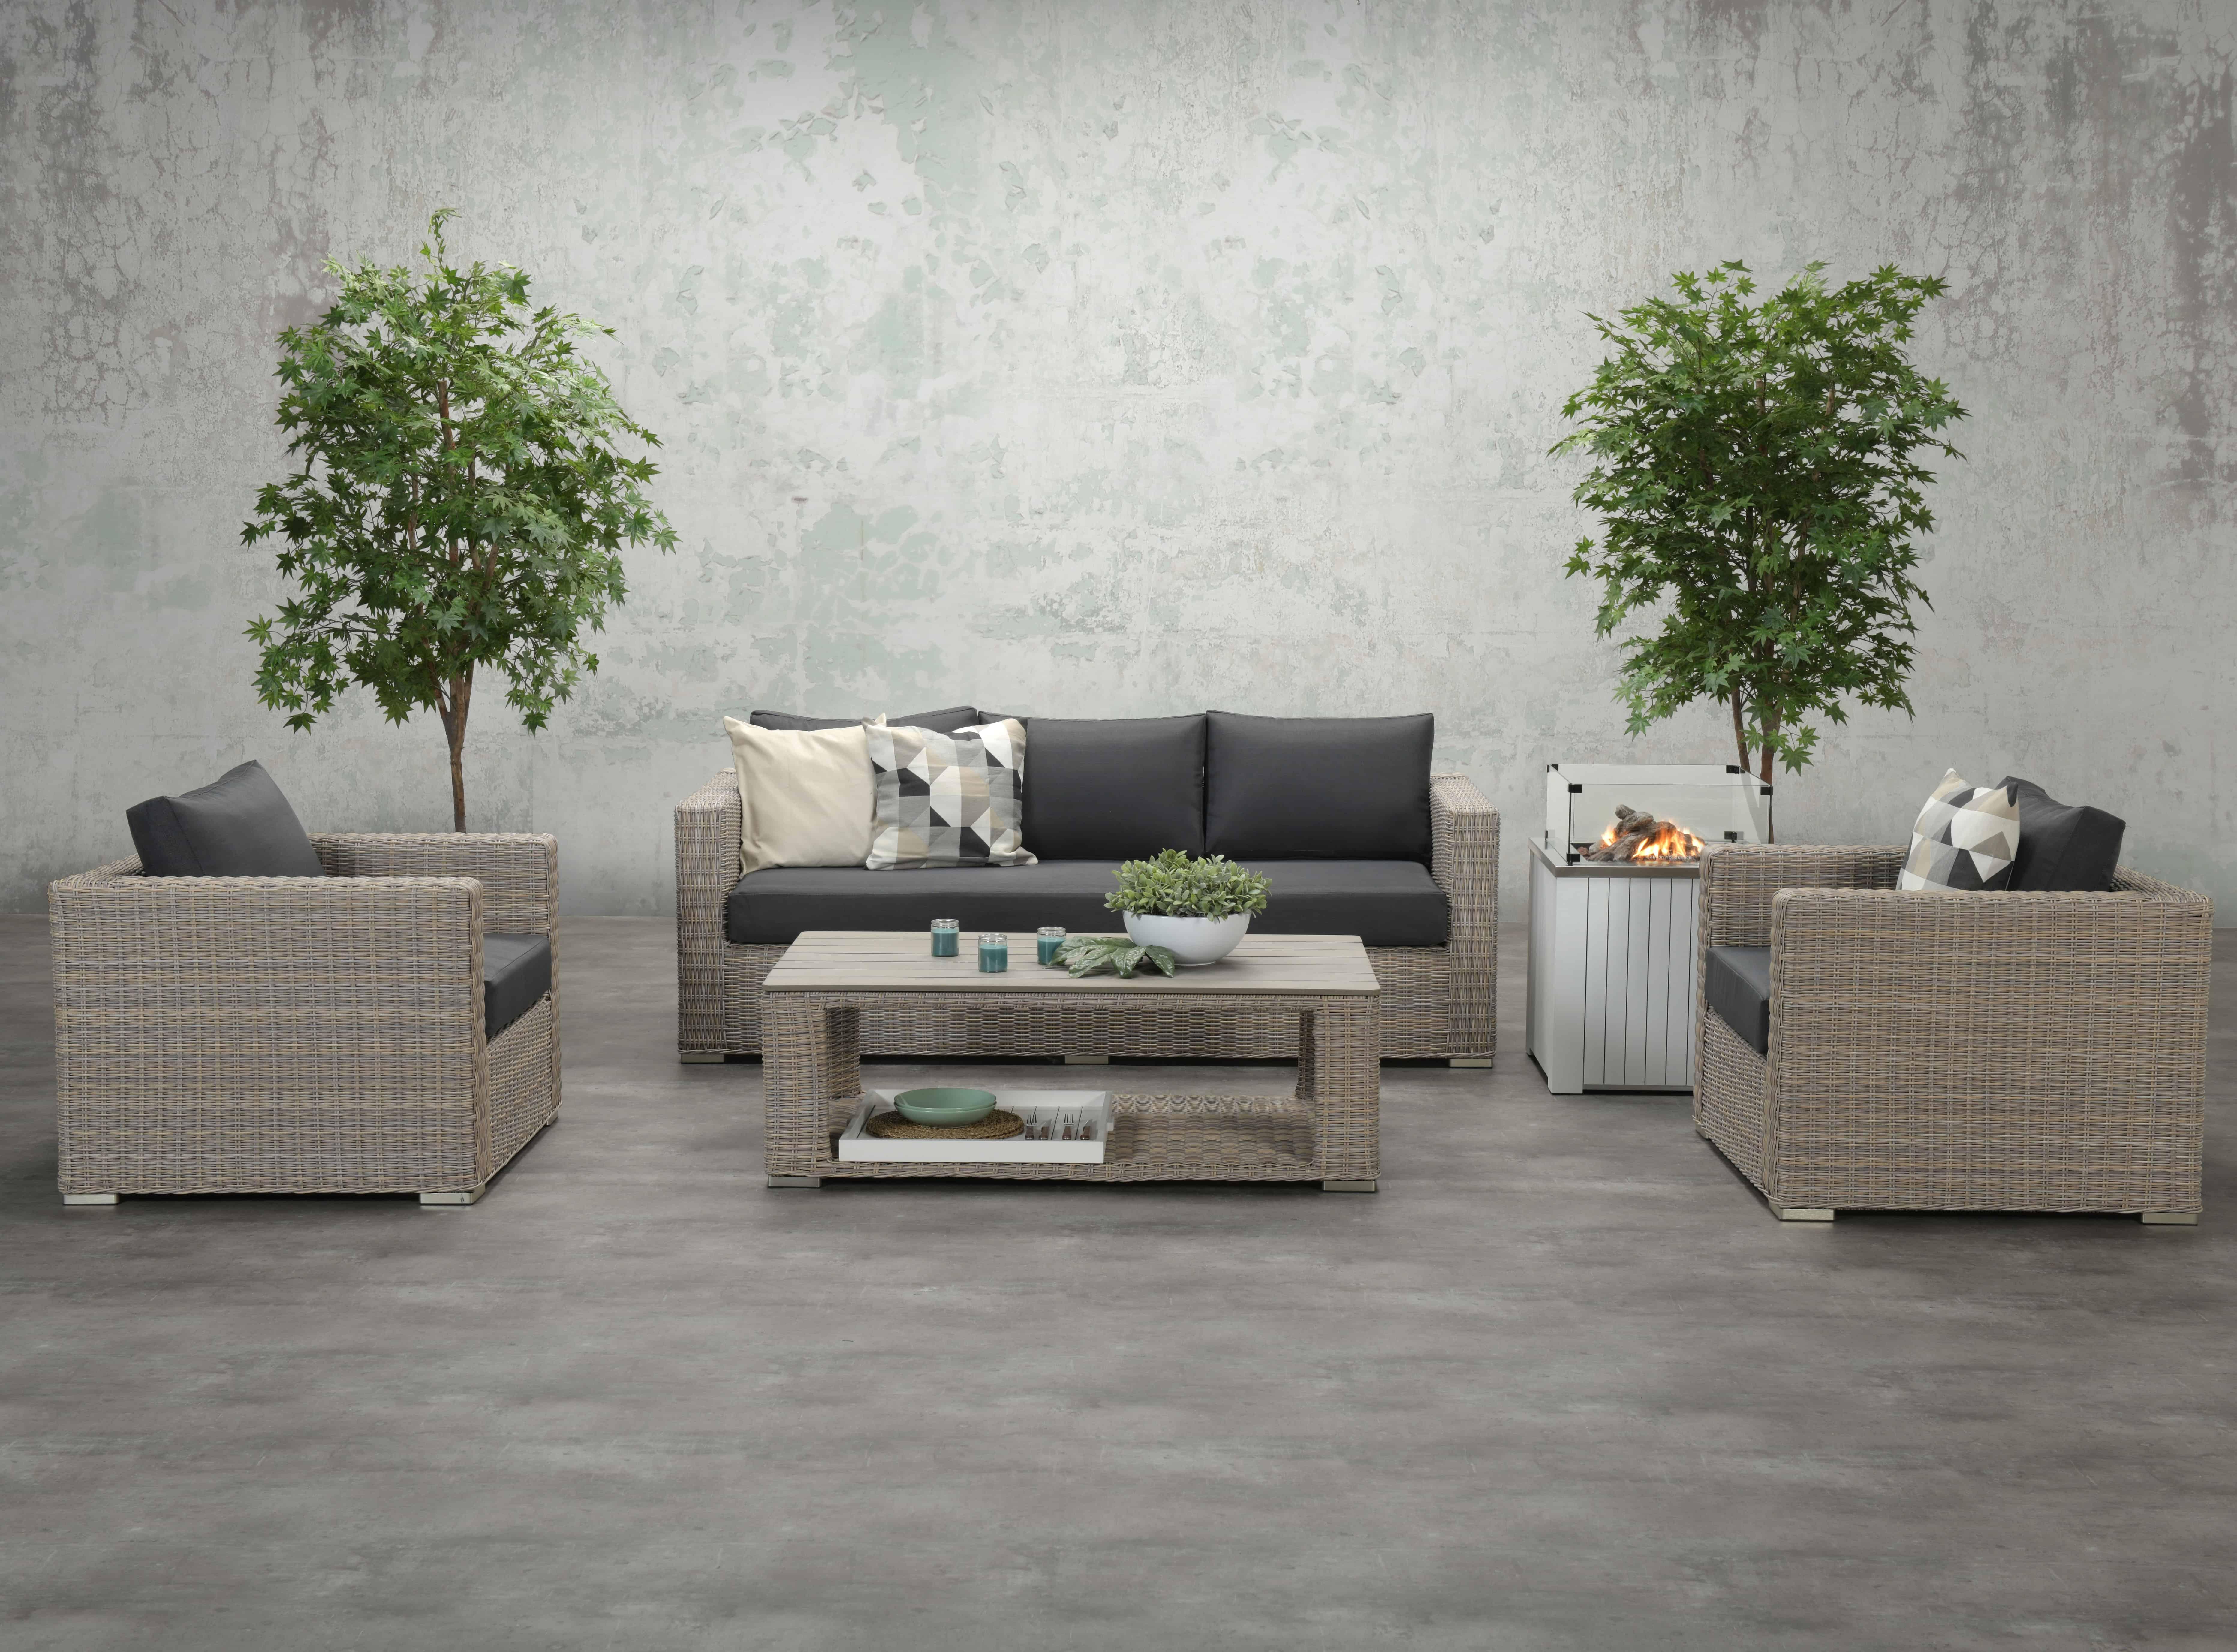 Valencia 3 Seater - Outdoor Furniture For Sale Dublin Ireland